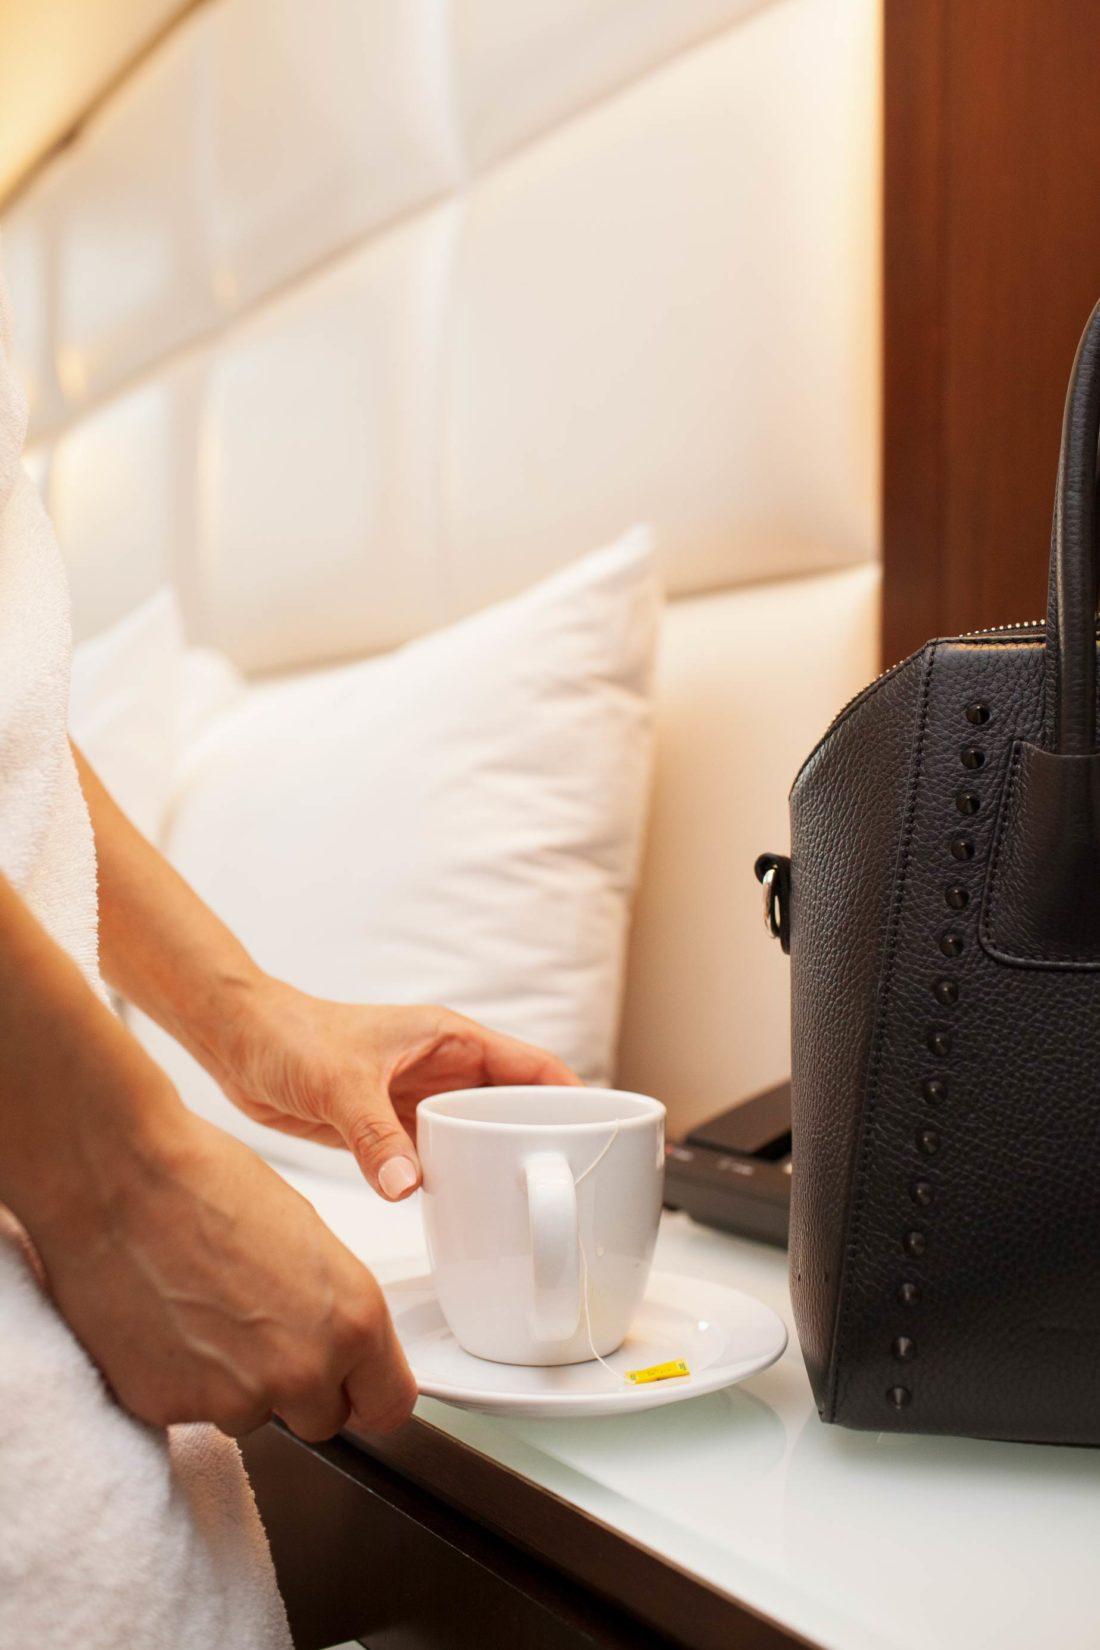 5 Ways to Unwind on Your Next Business Trip